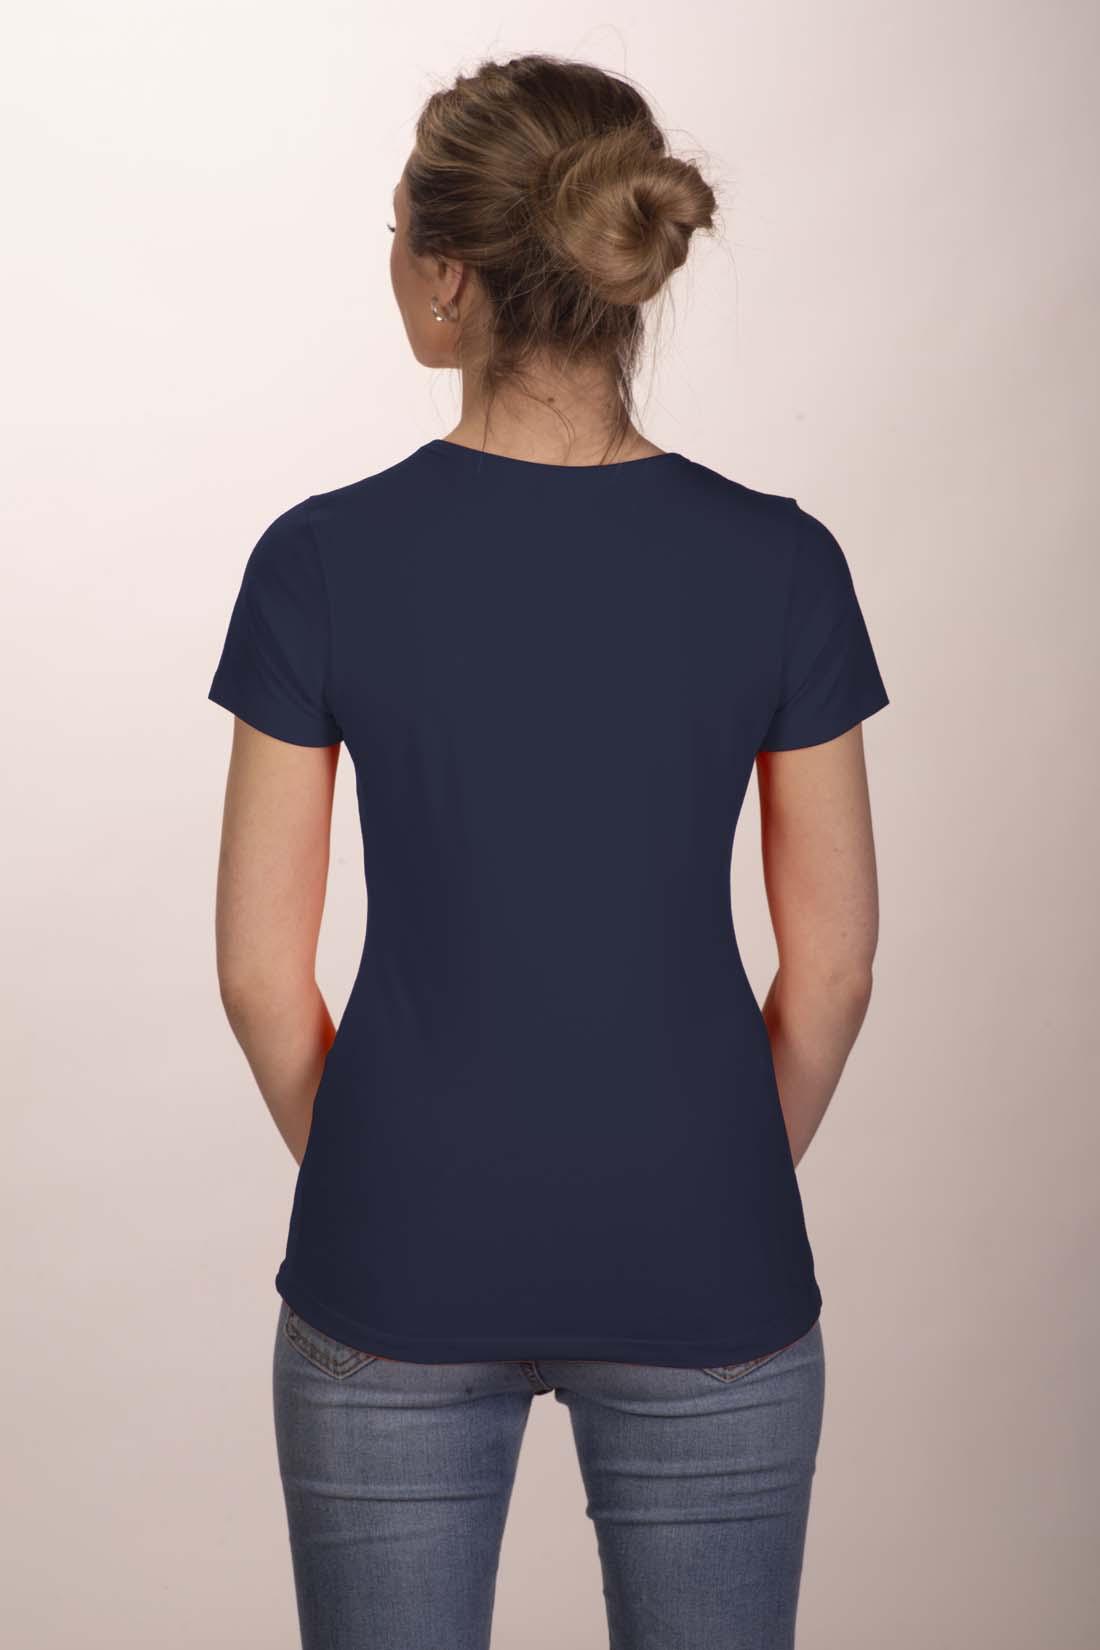 Футболка женская темно - синяя (стрейч) 2